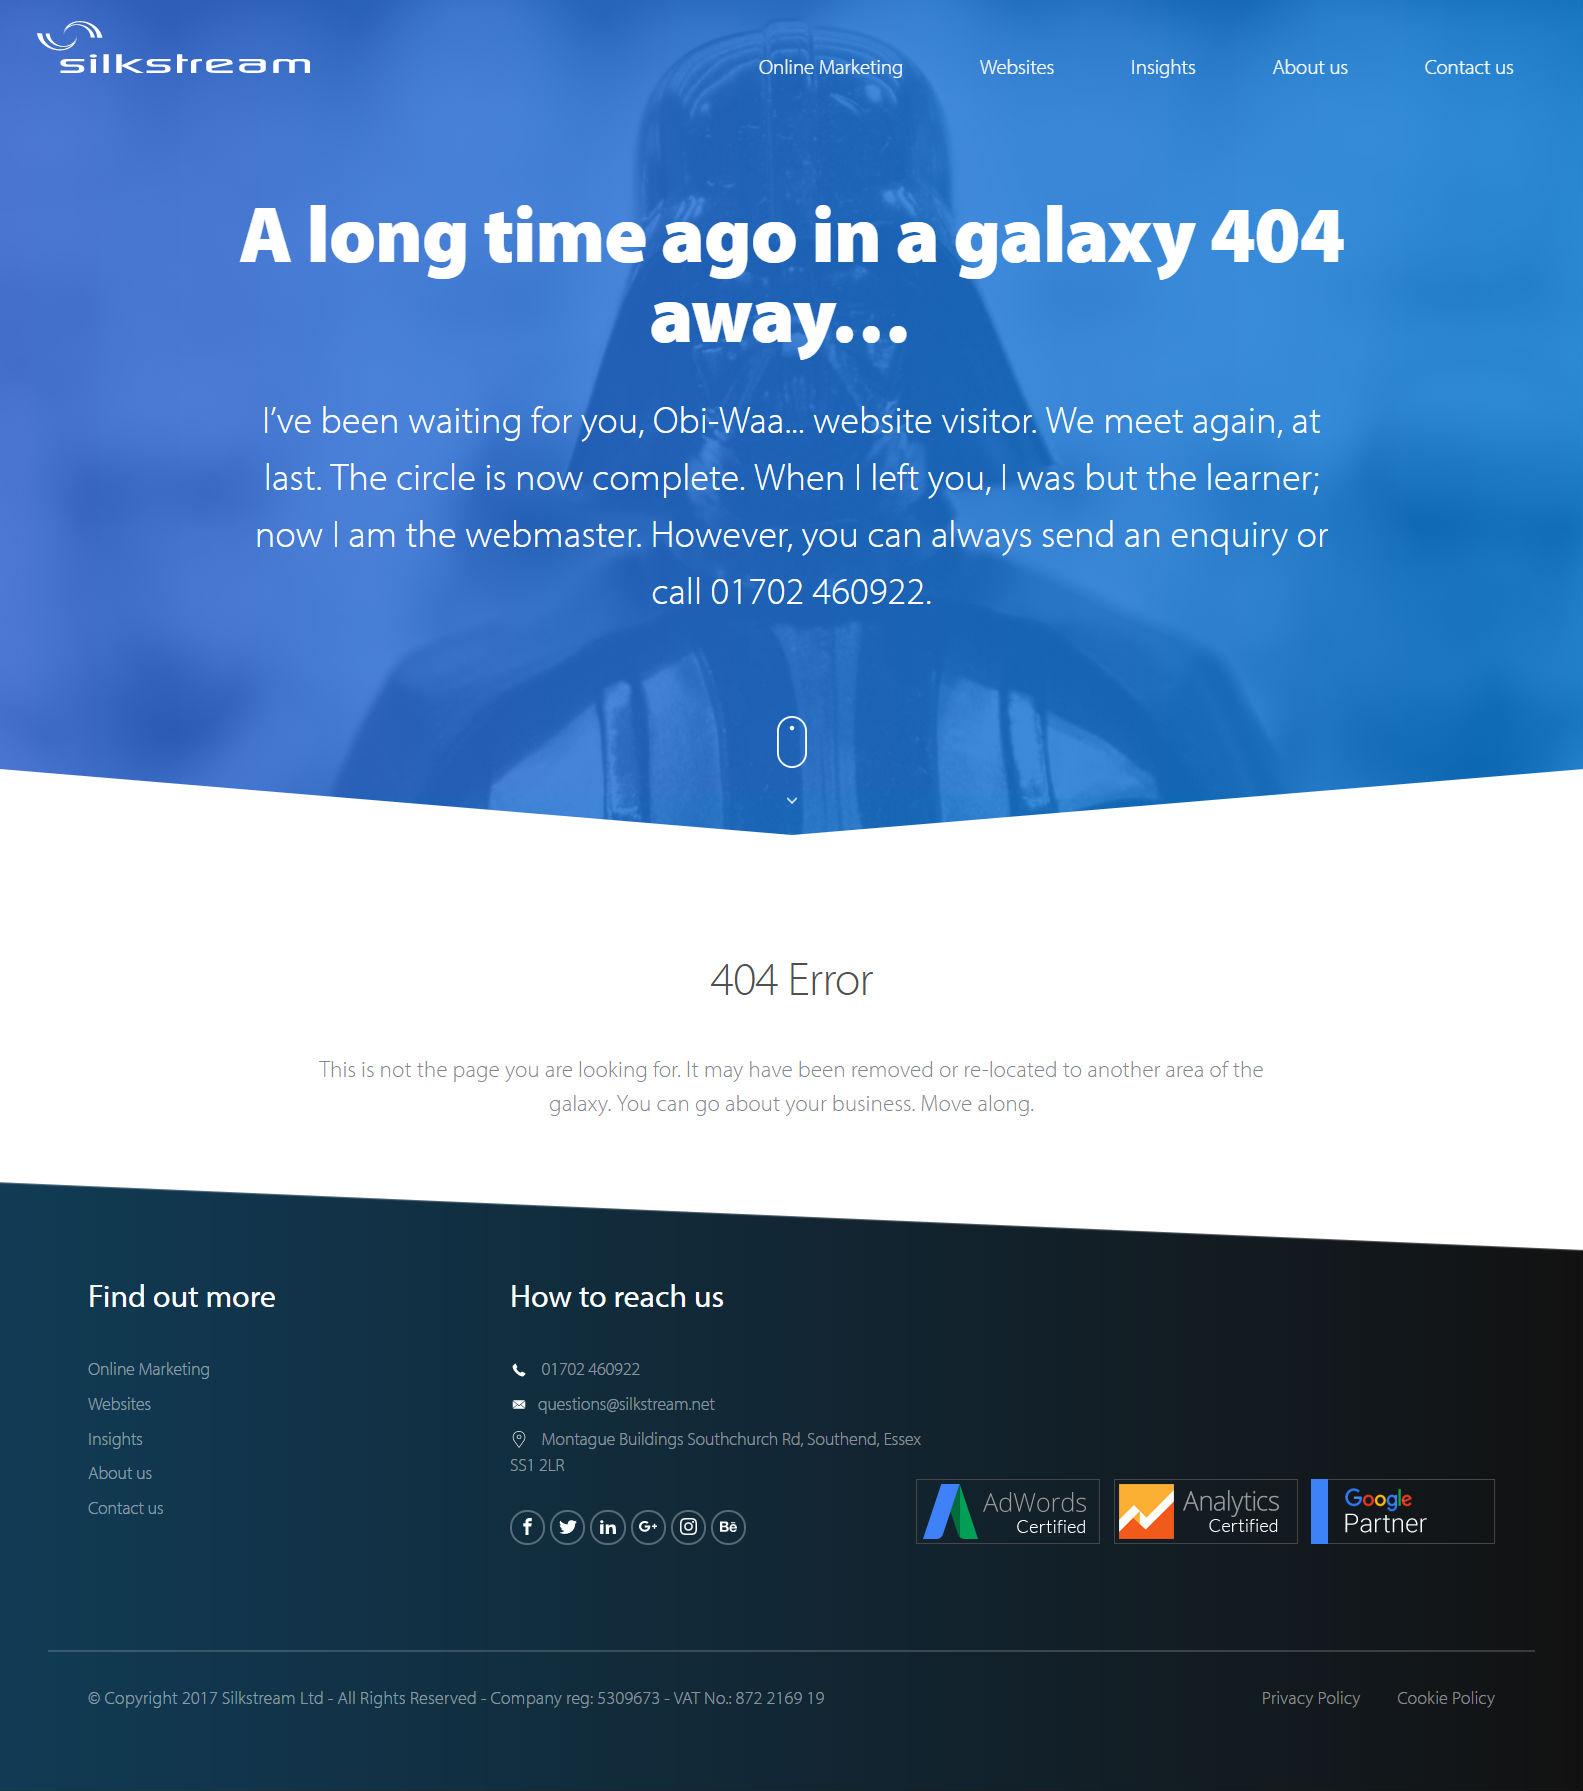 Silkstream 404